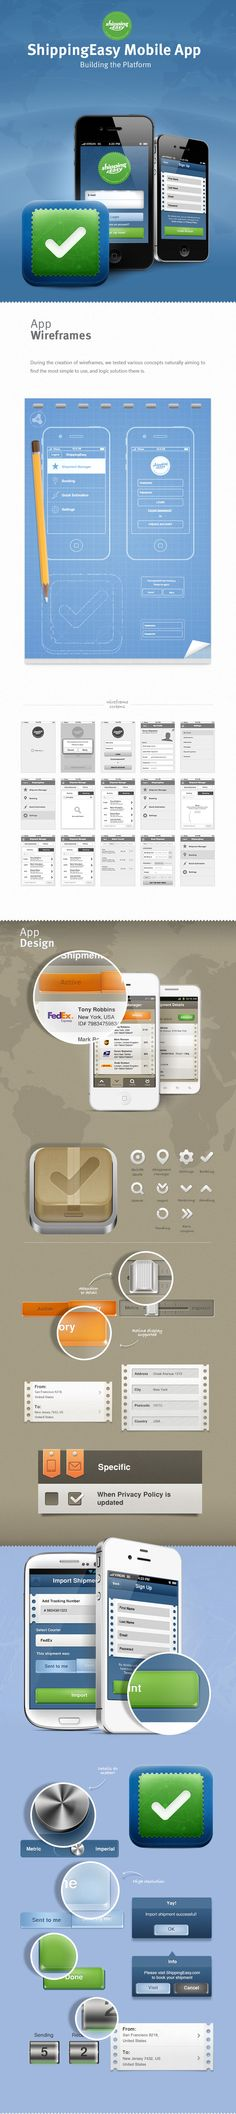 ShippingEasy Mobile App